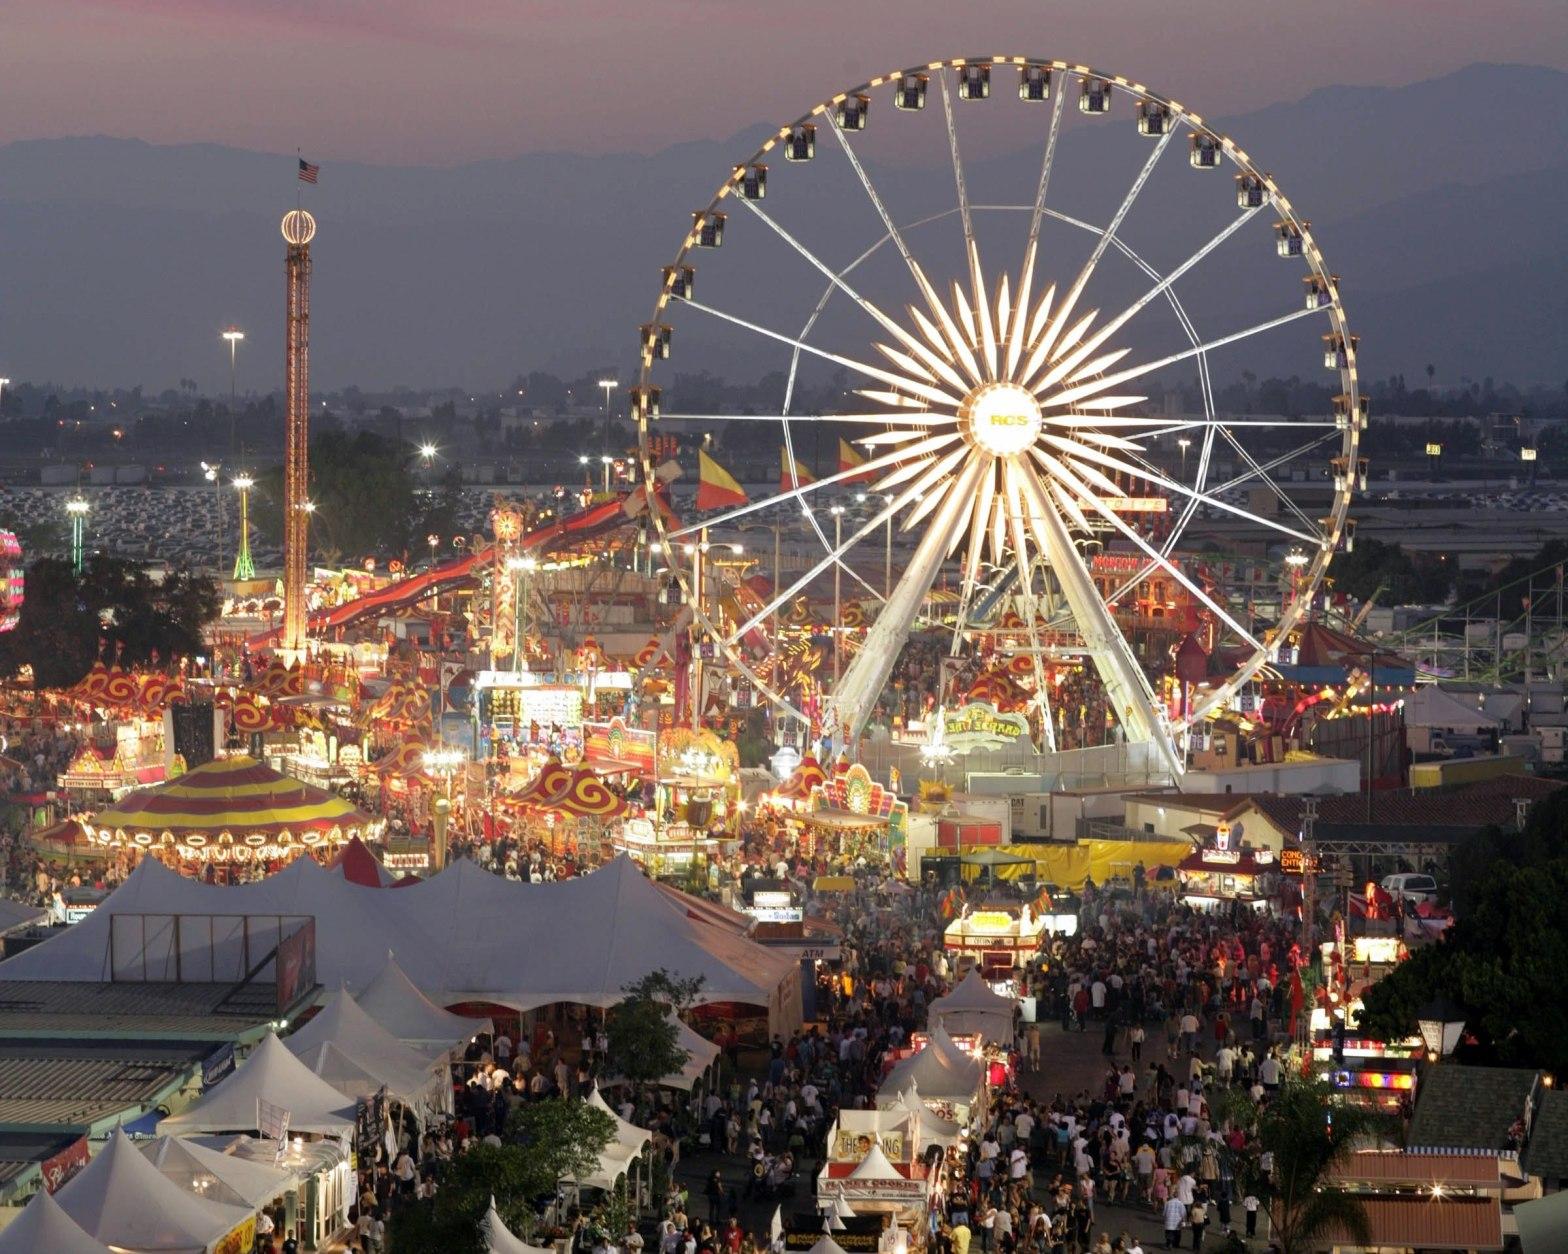 LA county fair Pomona, CA rooms for rent